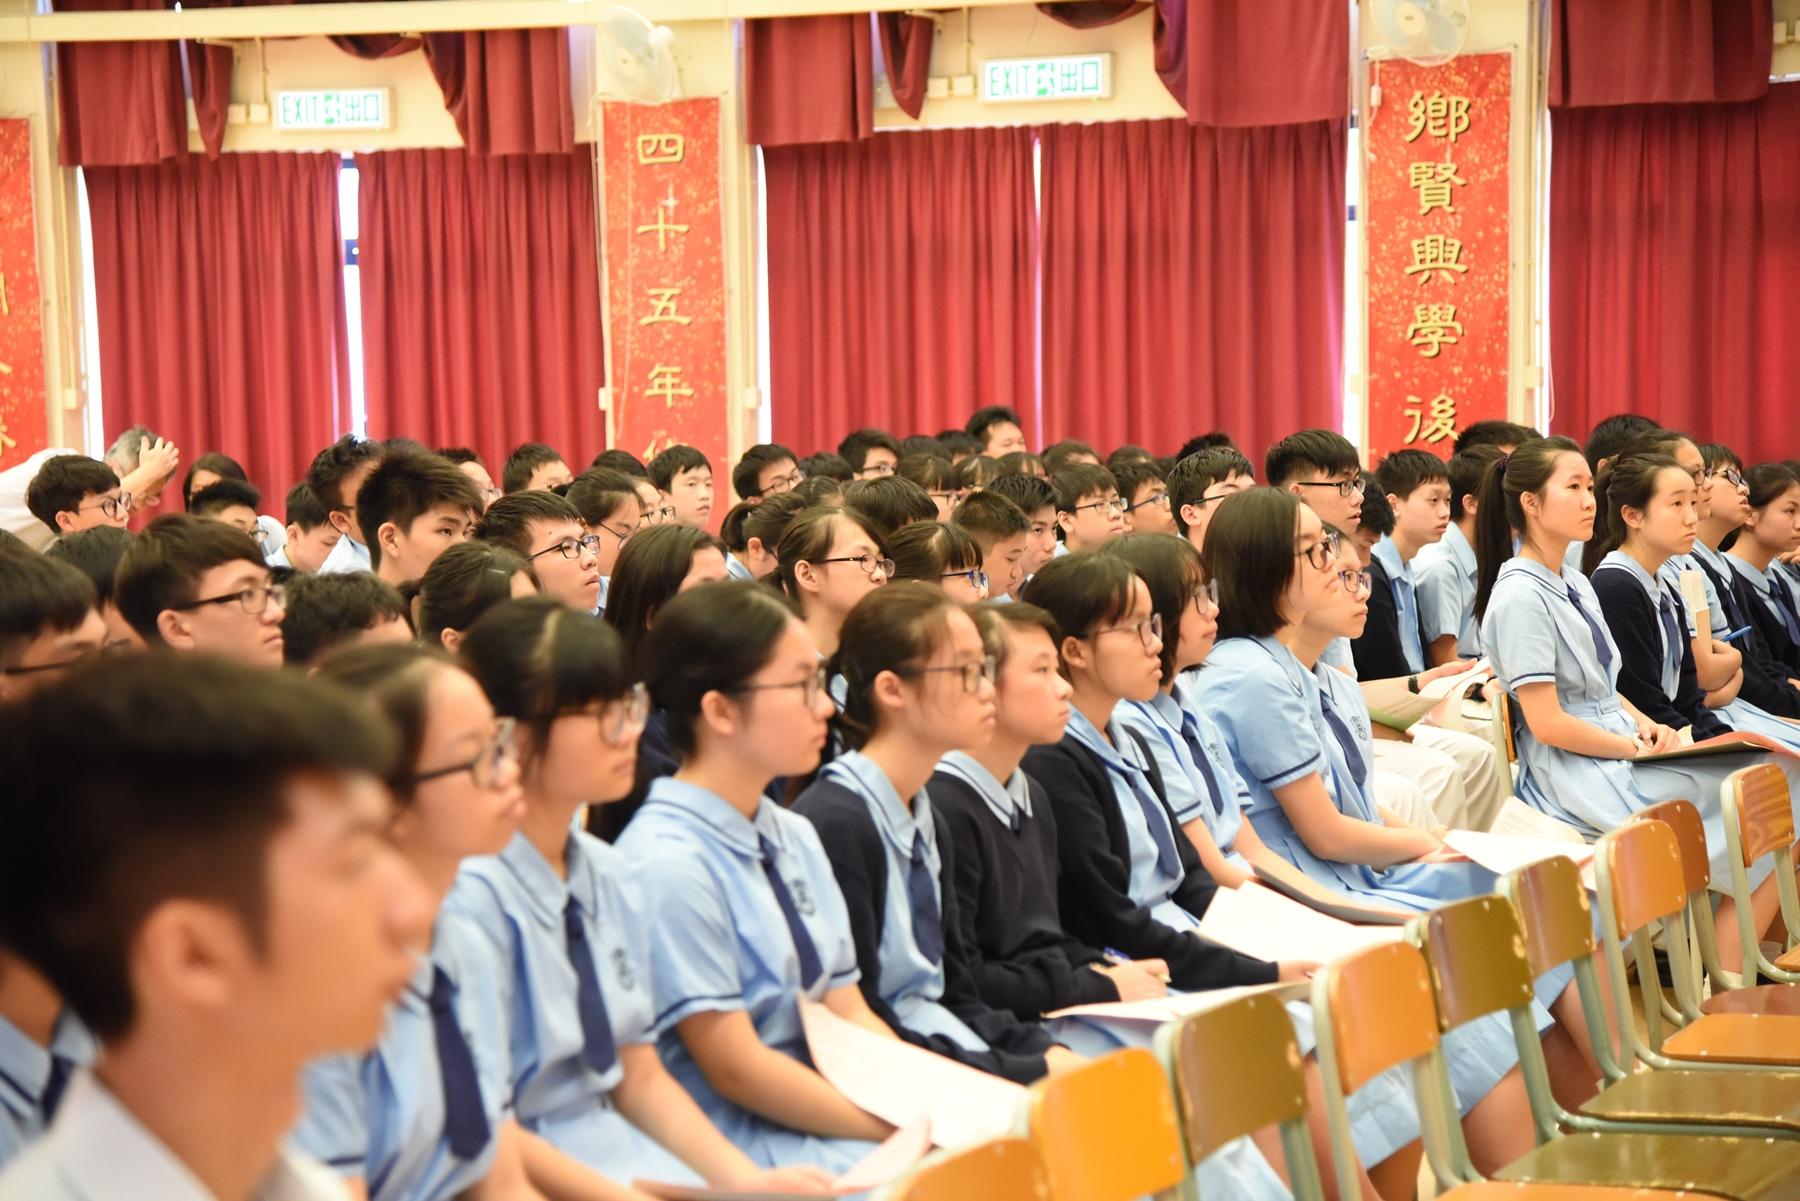 http://www.npc.edu.hk/sites/default/files/dsc_1372.jpg